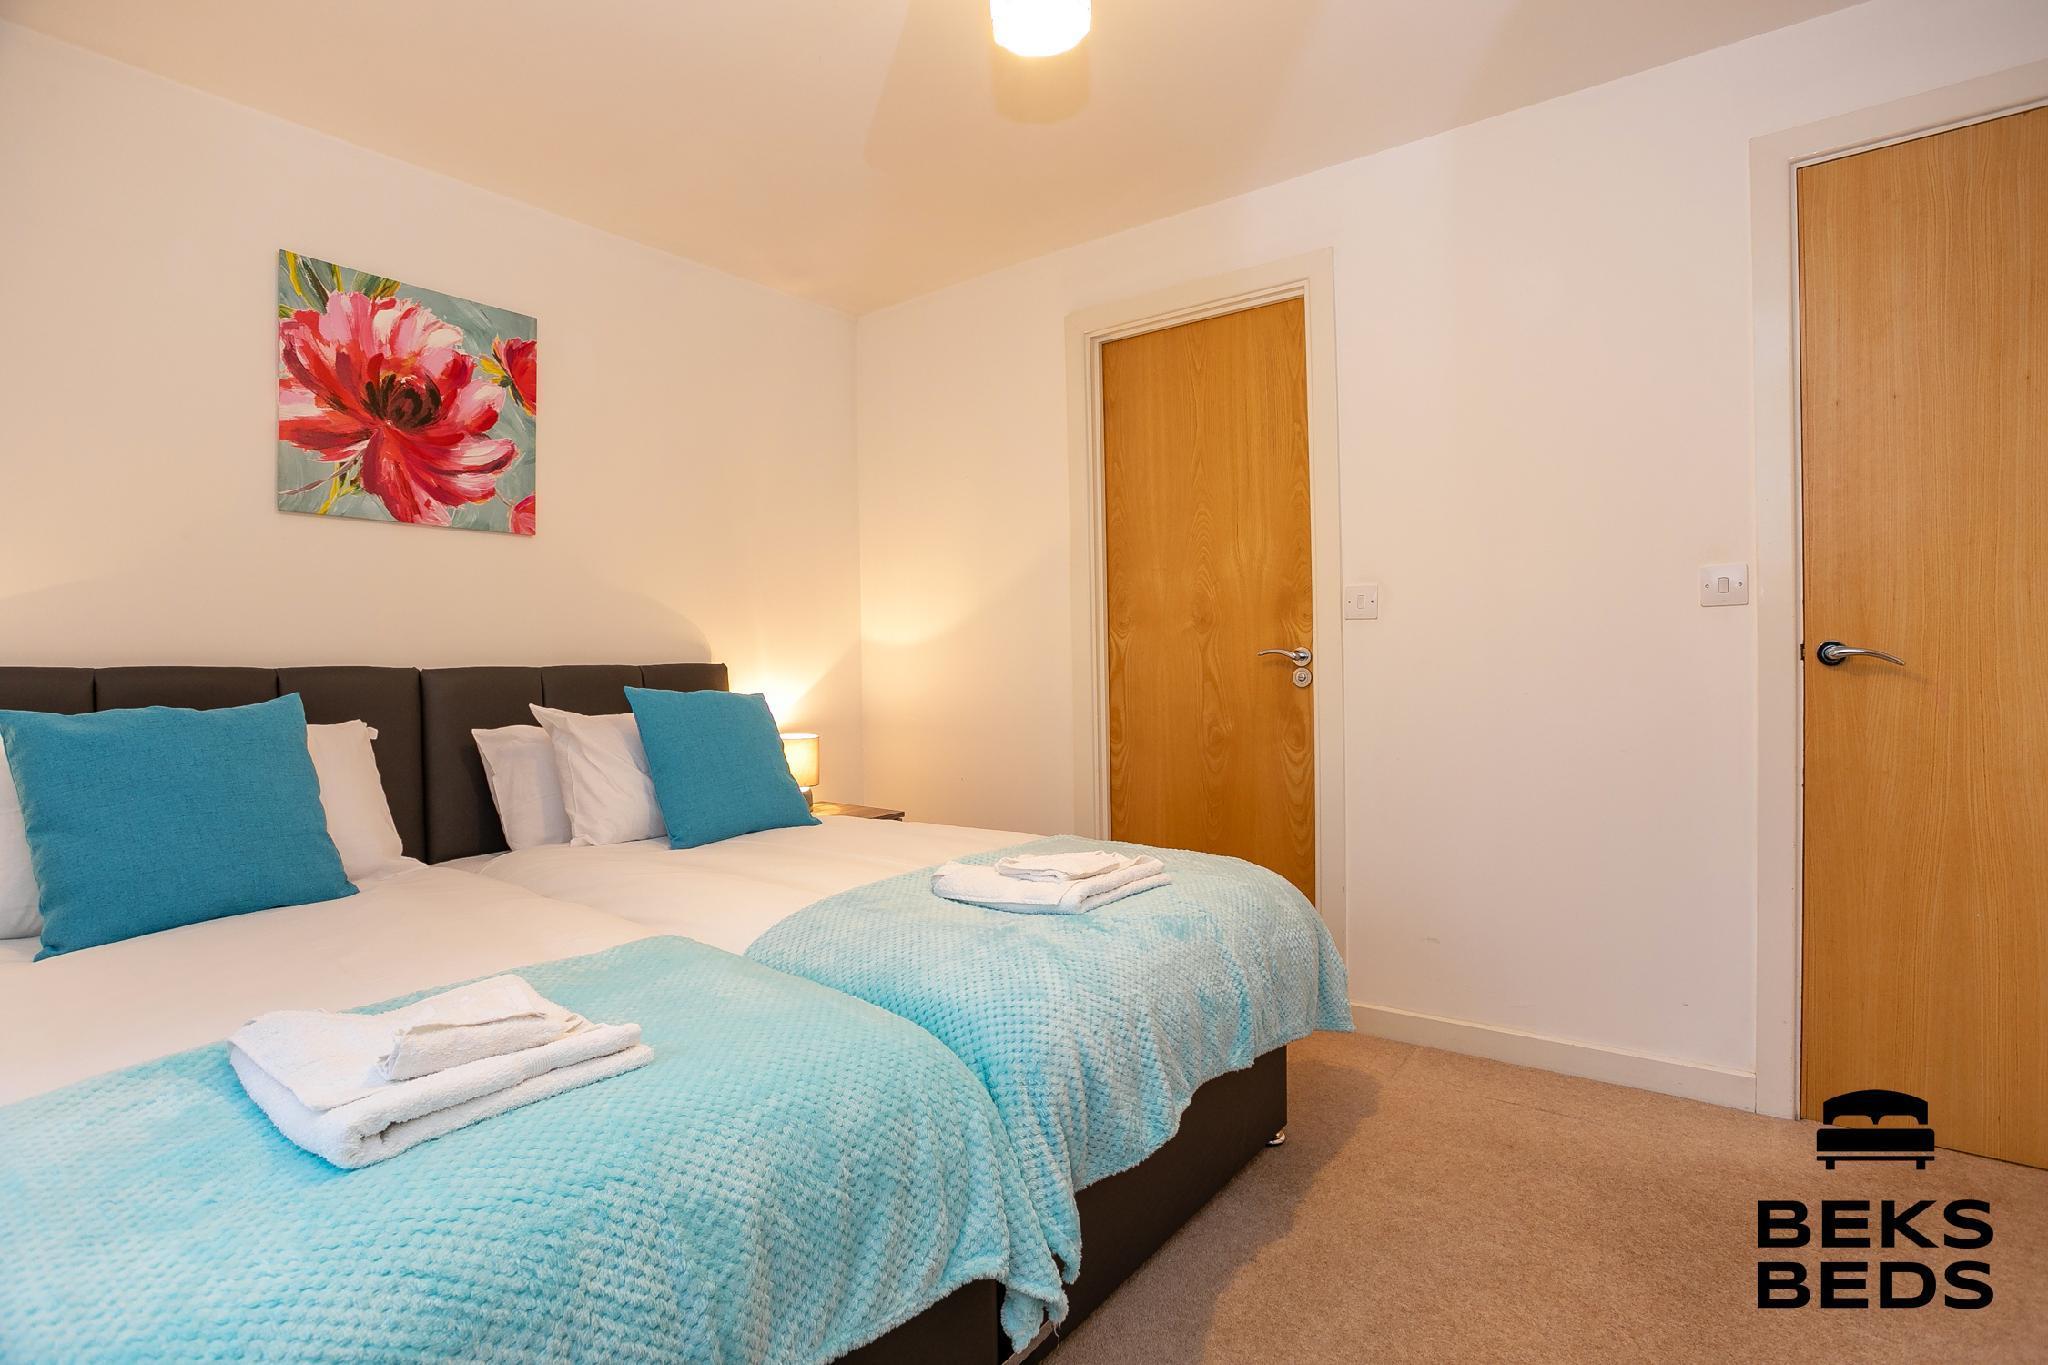 Woodfield Lodge near Gatwick Airport - Beks Beds